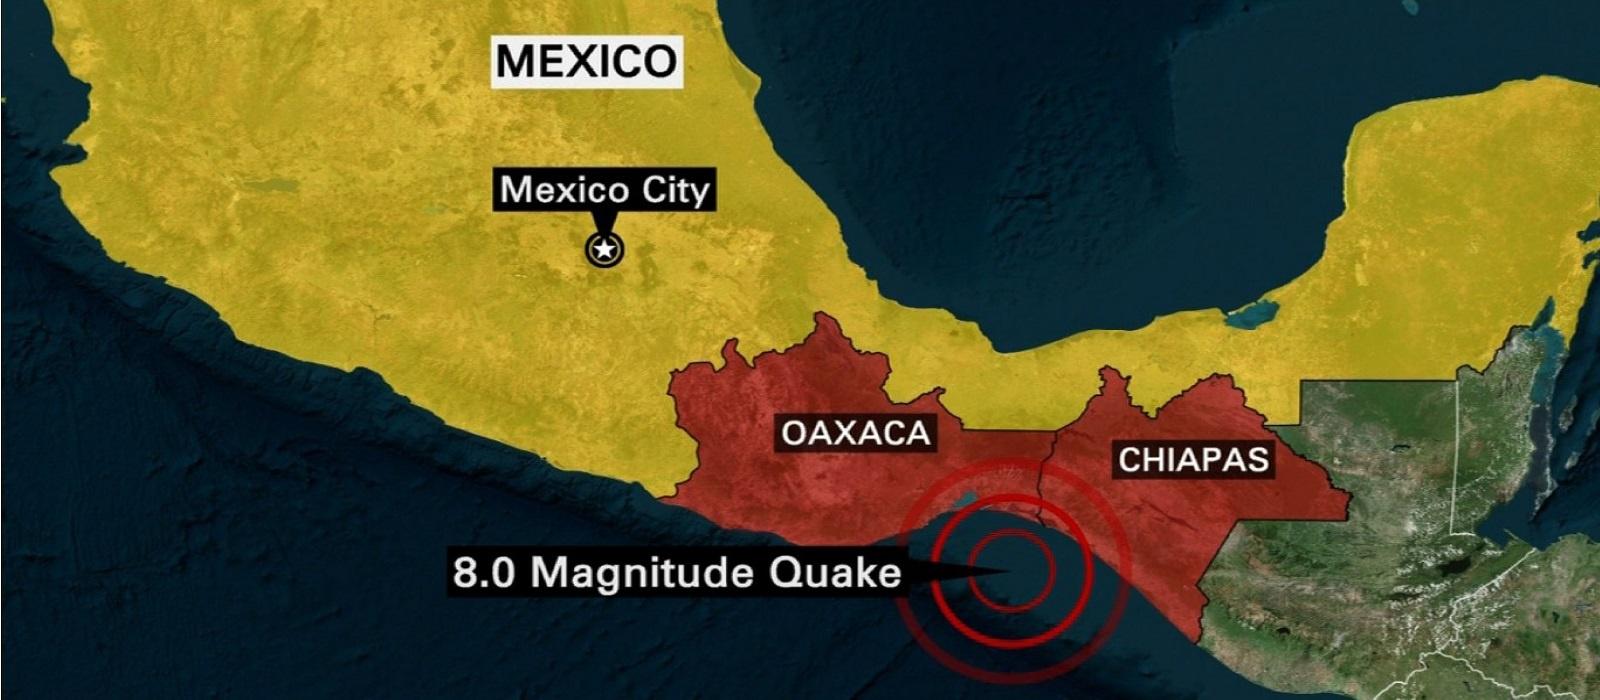 Mexico Slider.jpg